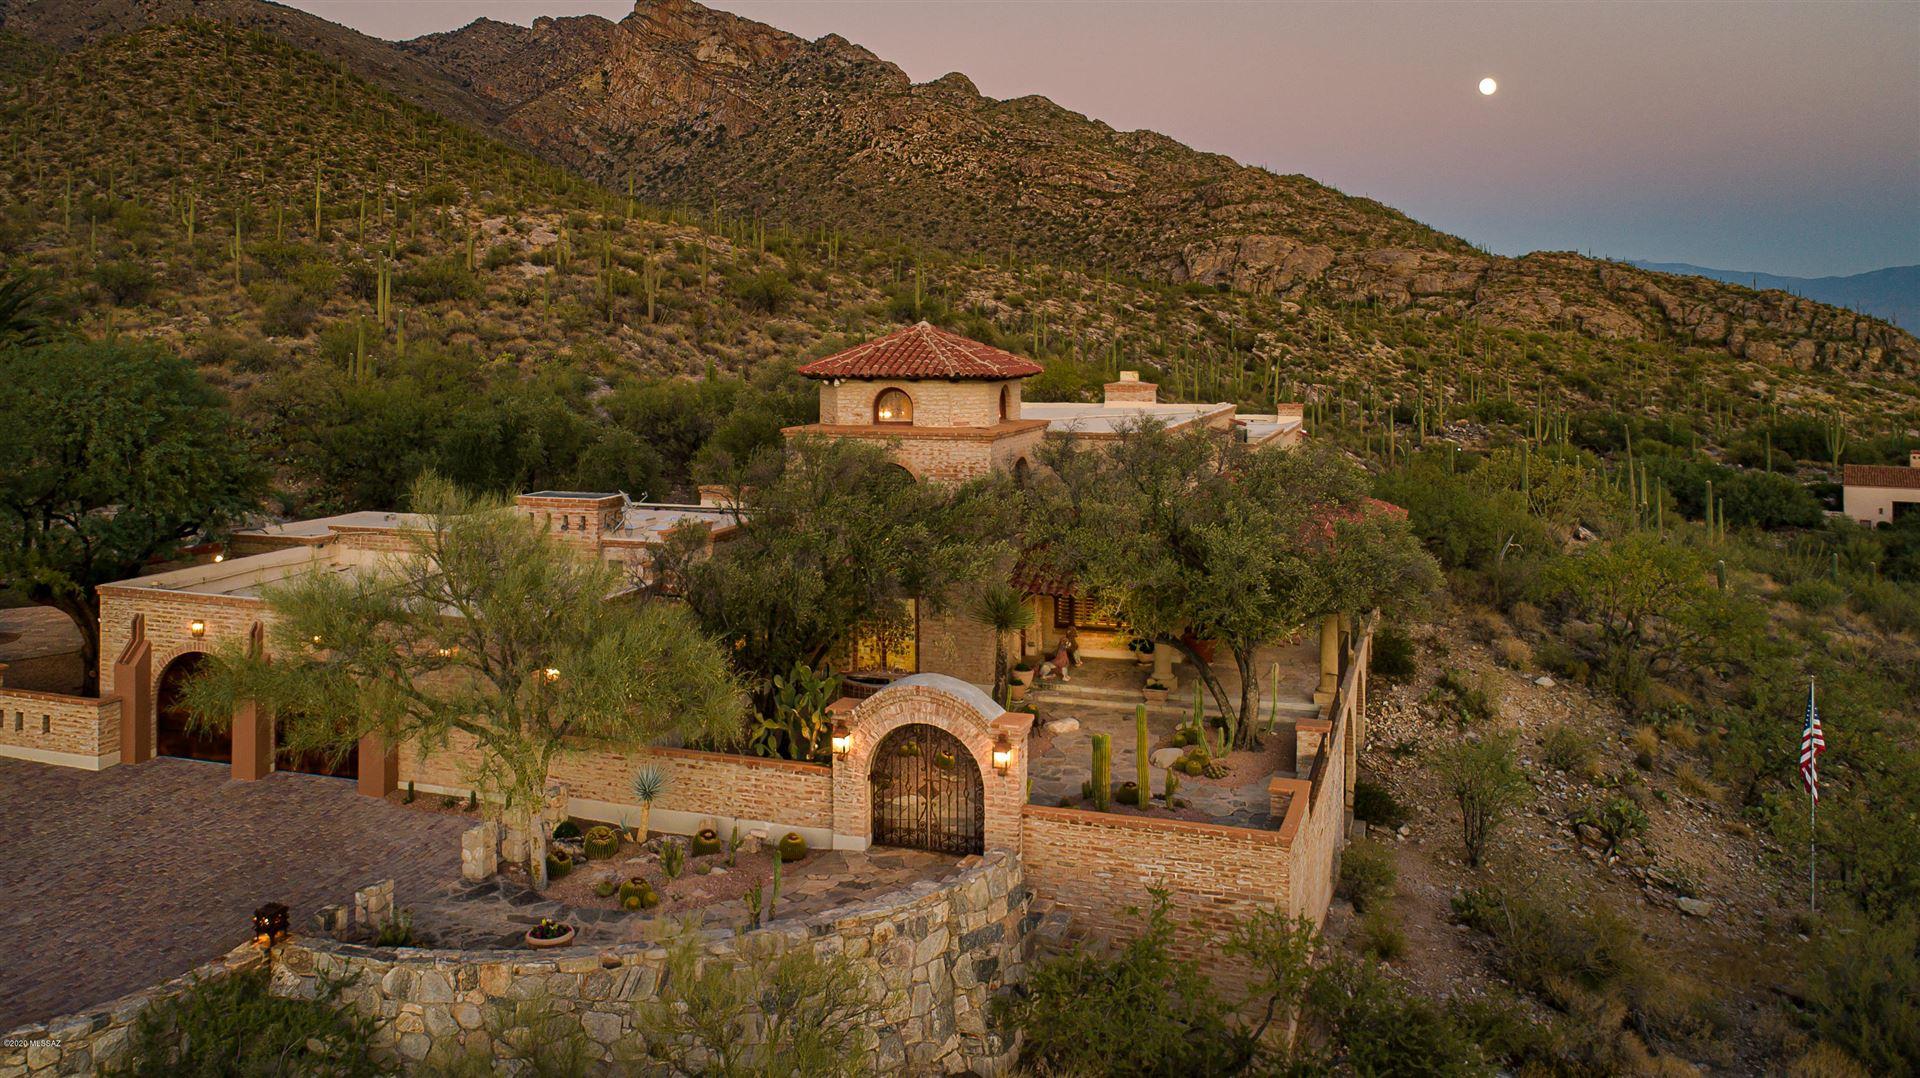 7200 N Finger Rock Place, Tucson, AZ 85718 - MLS#: 22011997